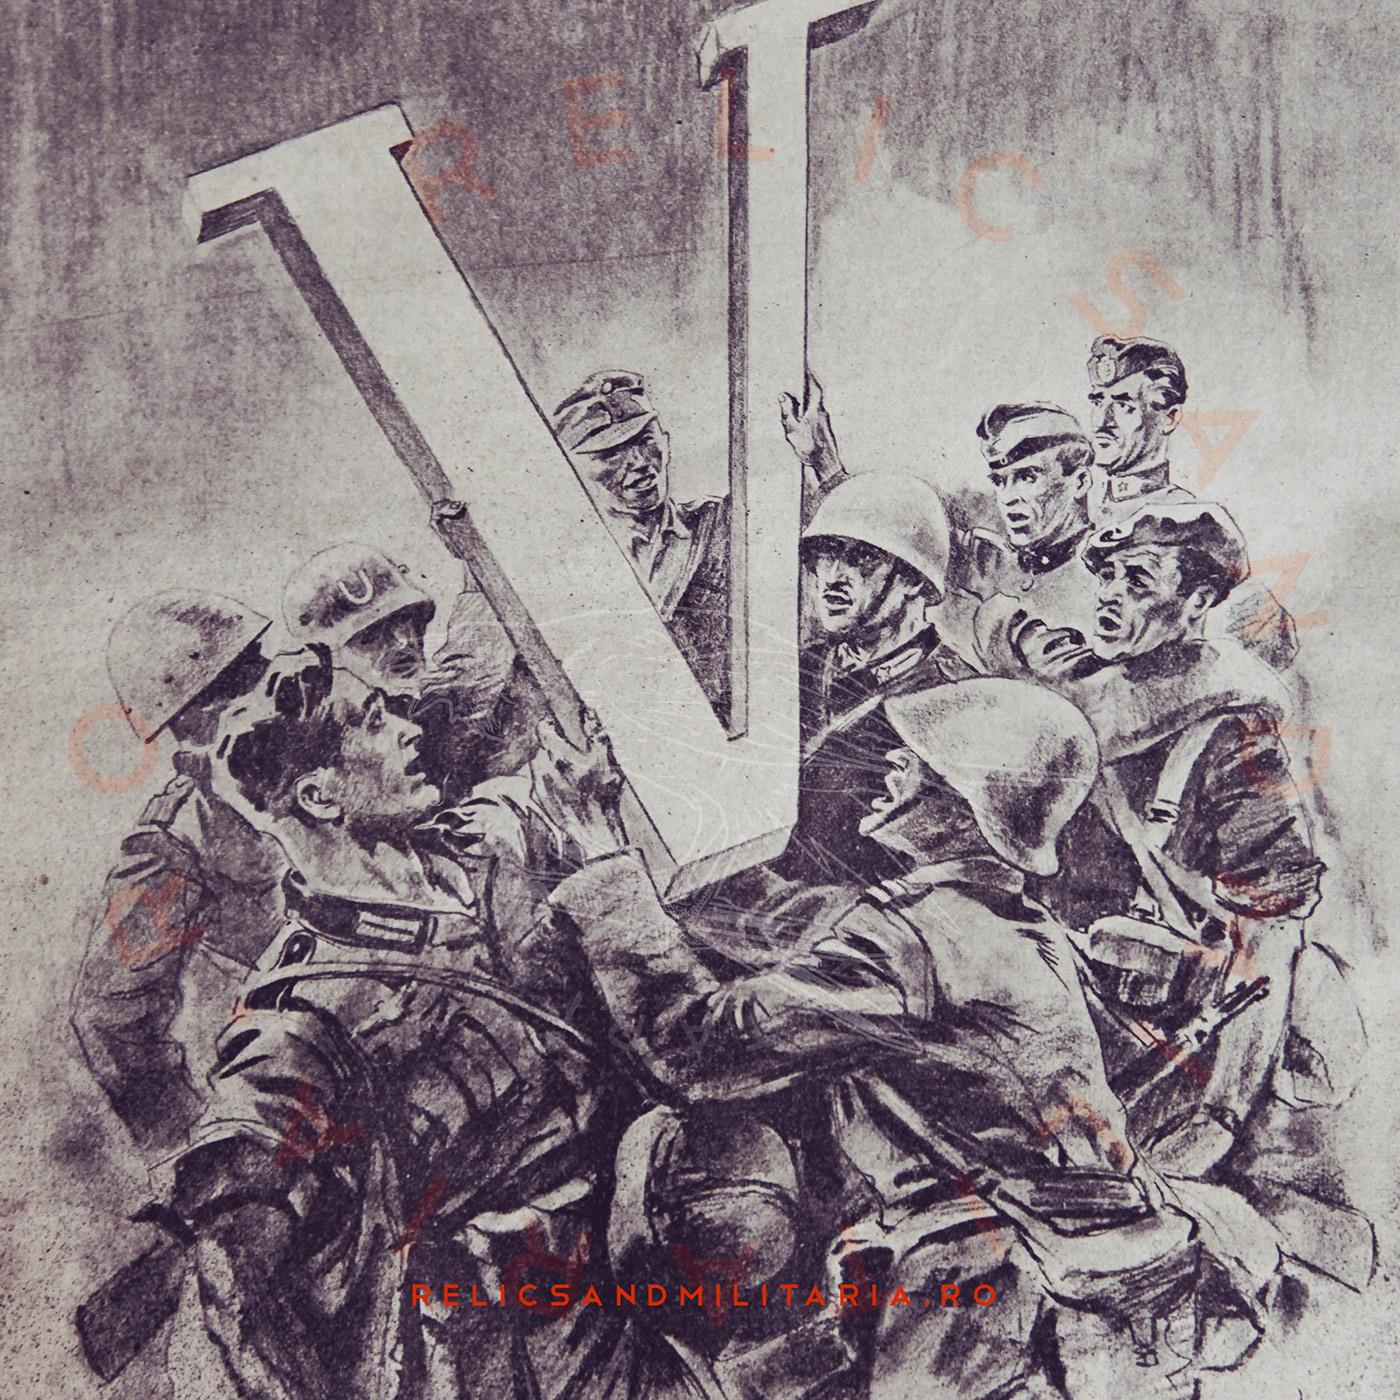 The German comrade - Der deutsche kamerad